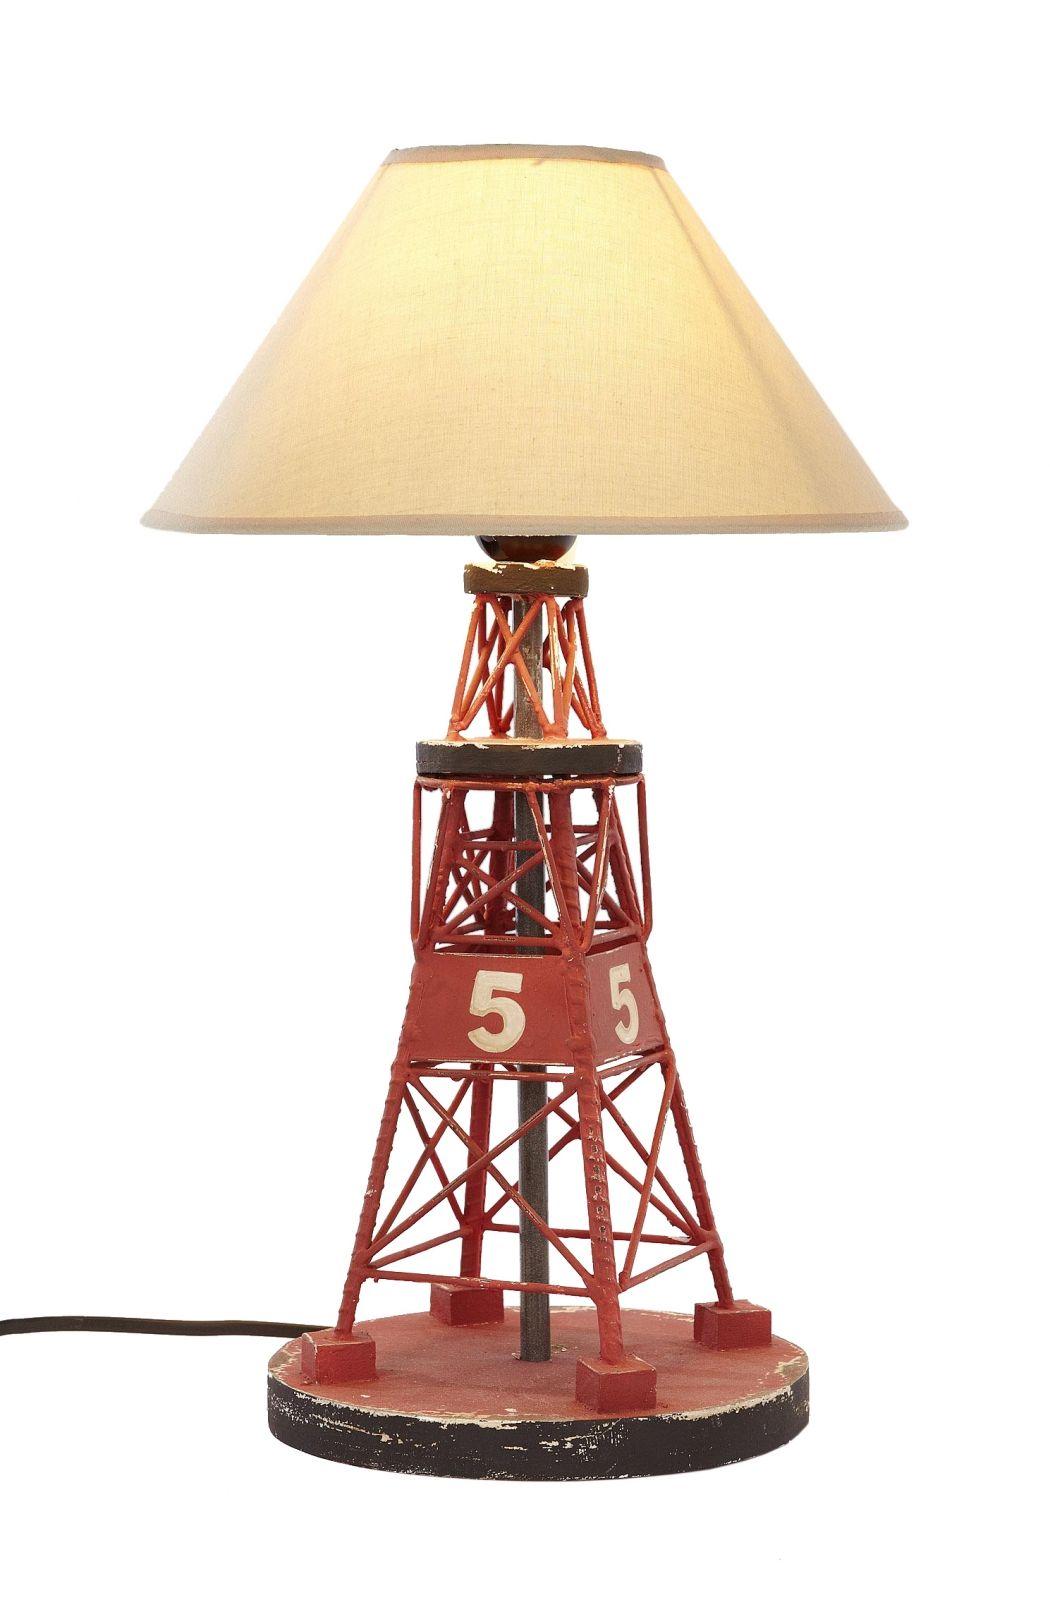 € 59,95 Lampe Holzboje 5 : Schirmlampe mit einer roten Boje als Sockel.